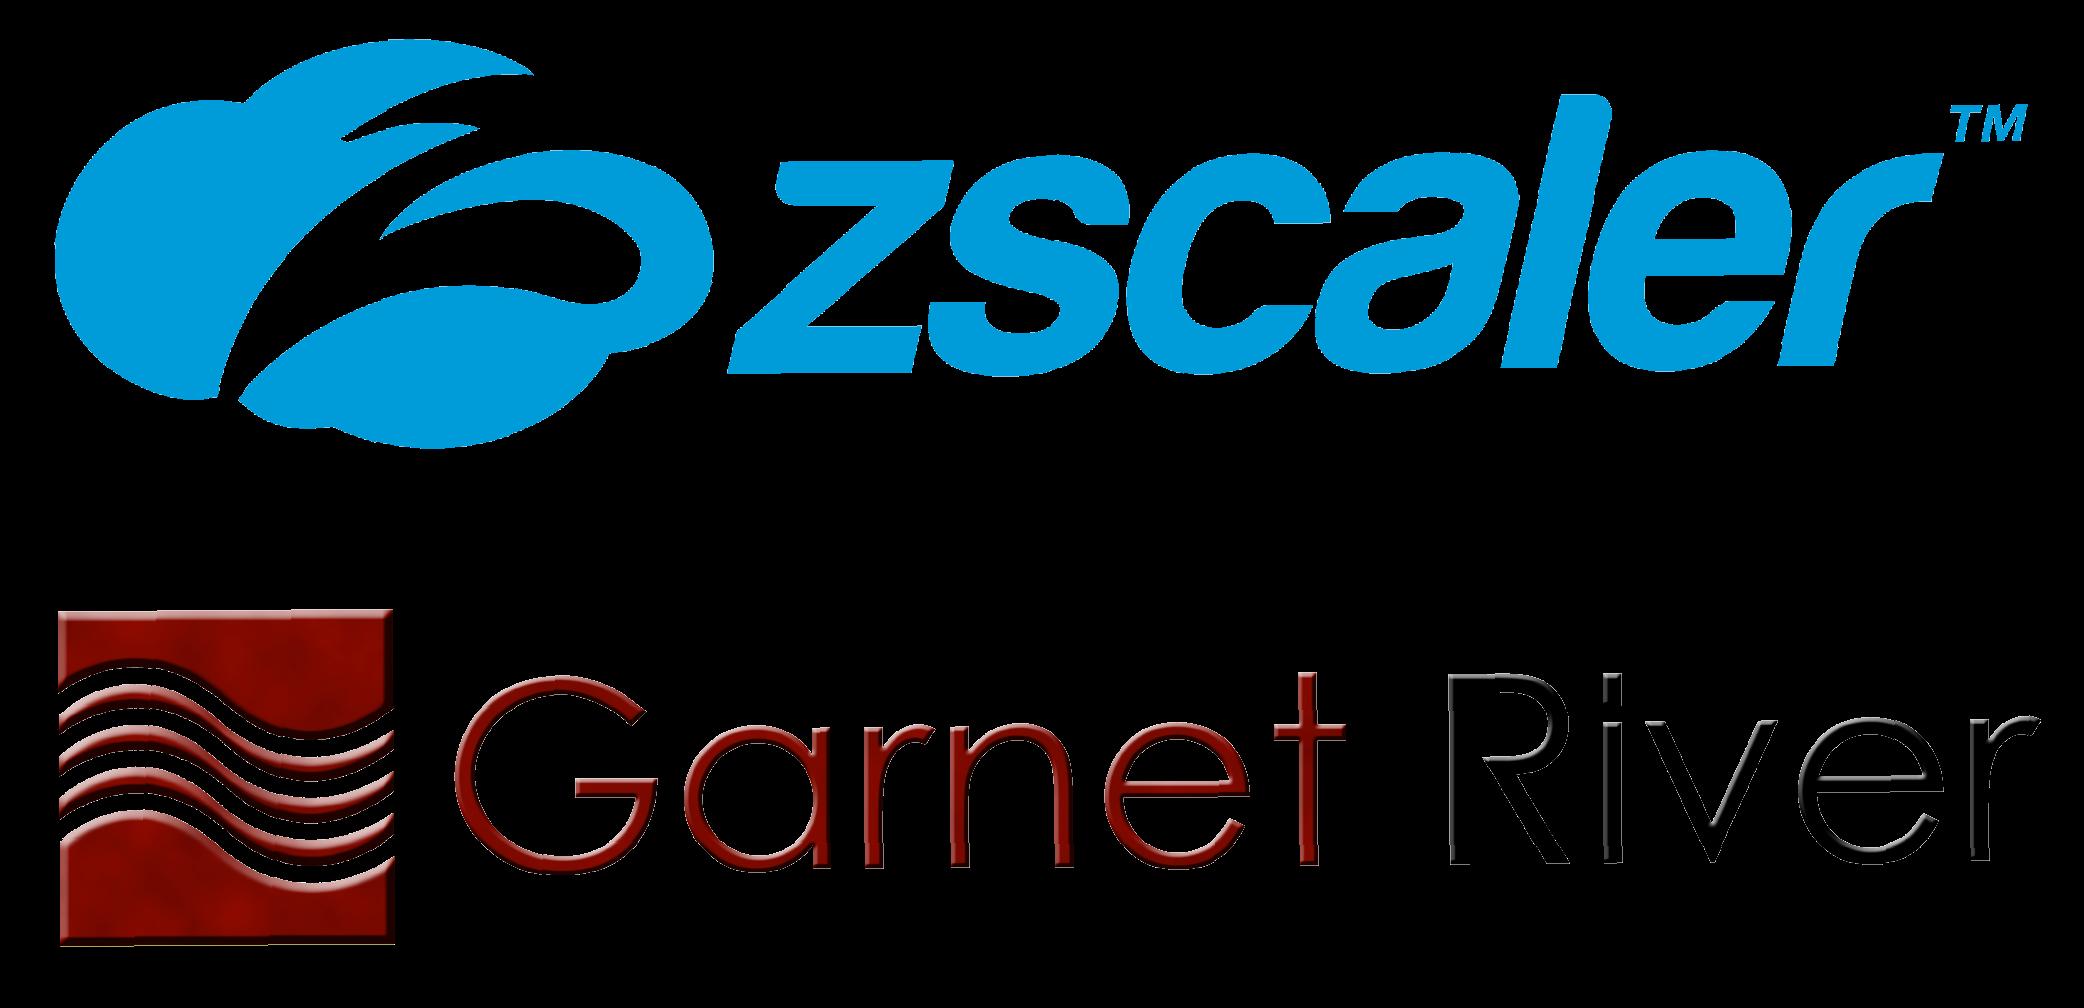 Zscaler and Garnet River logos